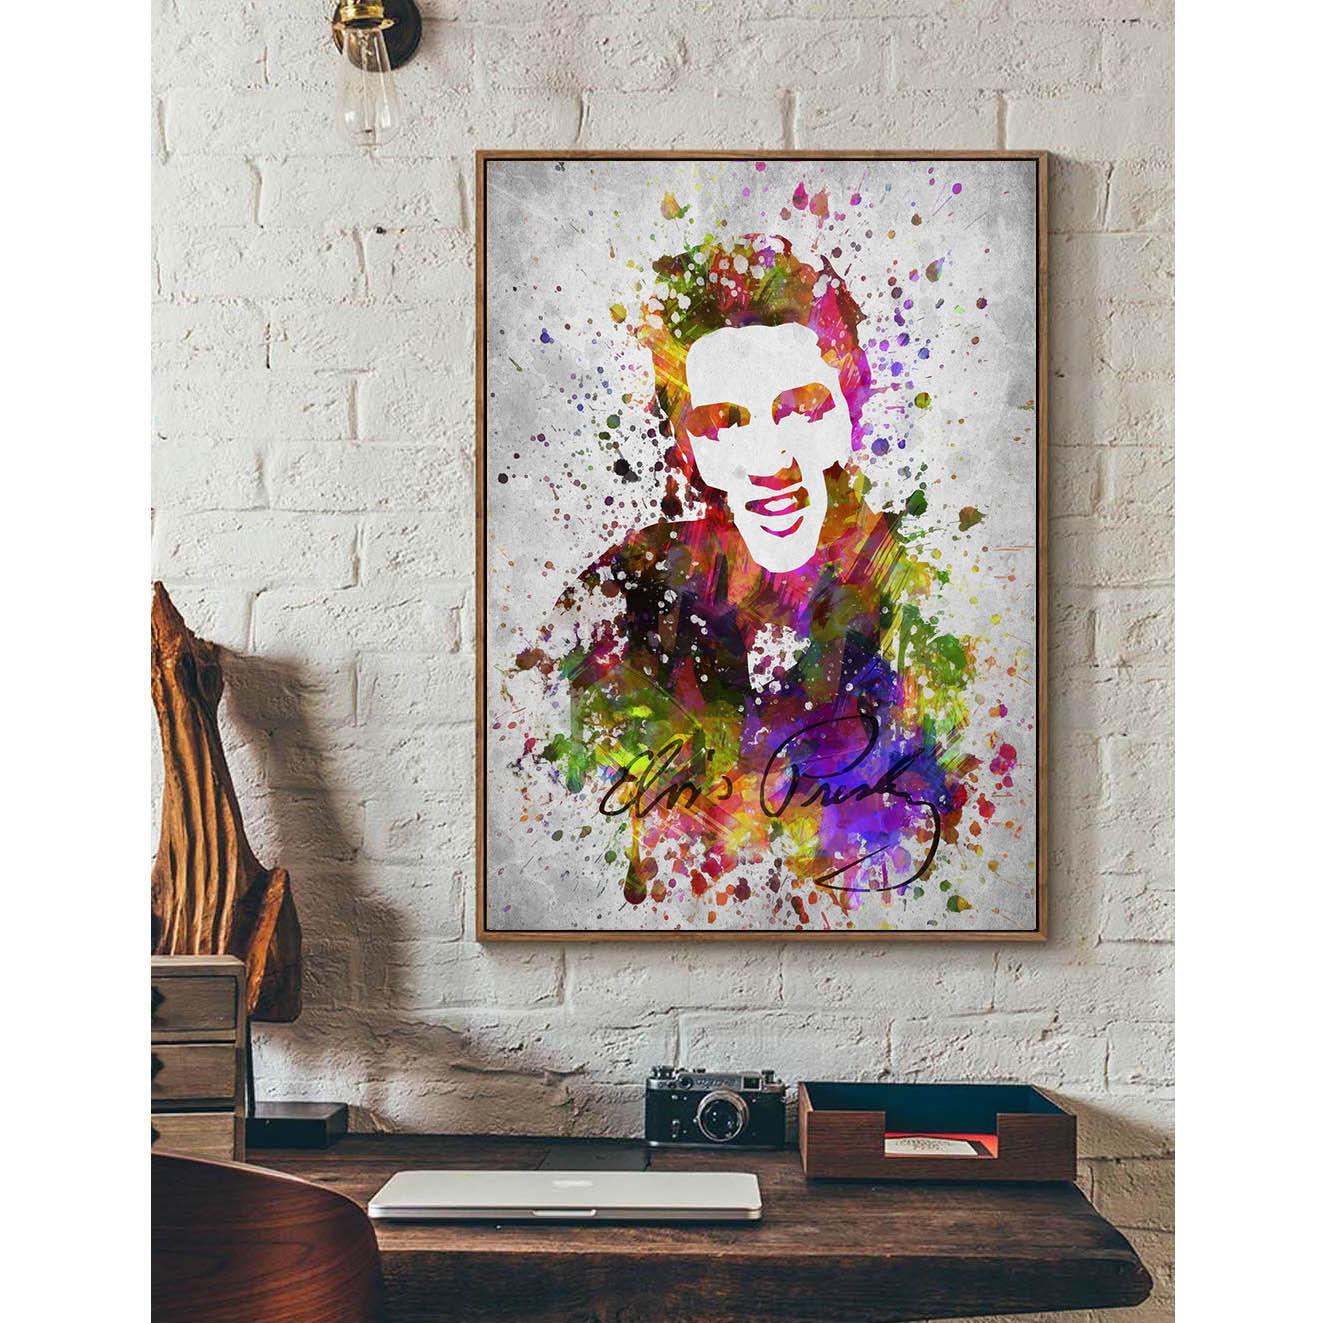 Elvis presley minimalism art art canvas poster print for Modern home decor gifts